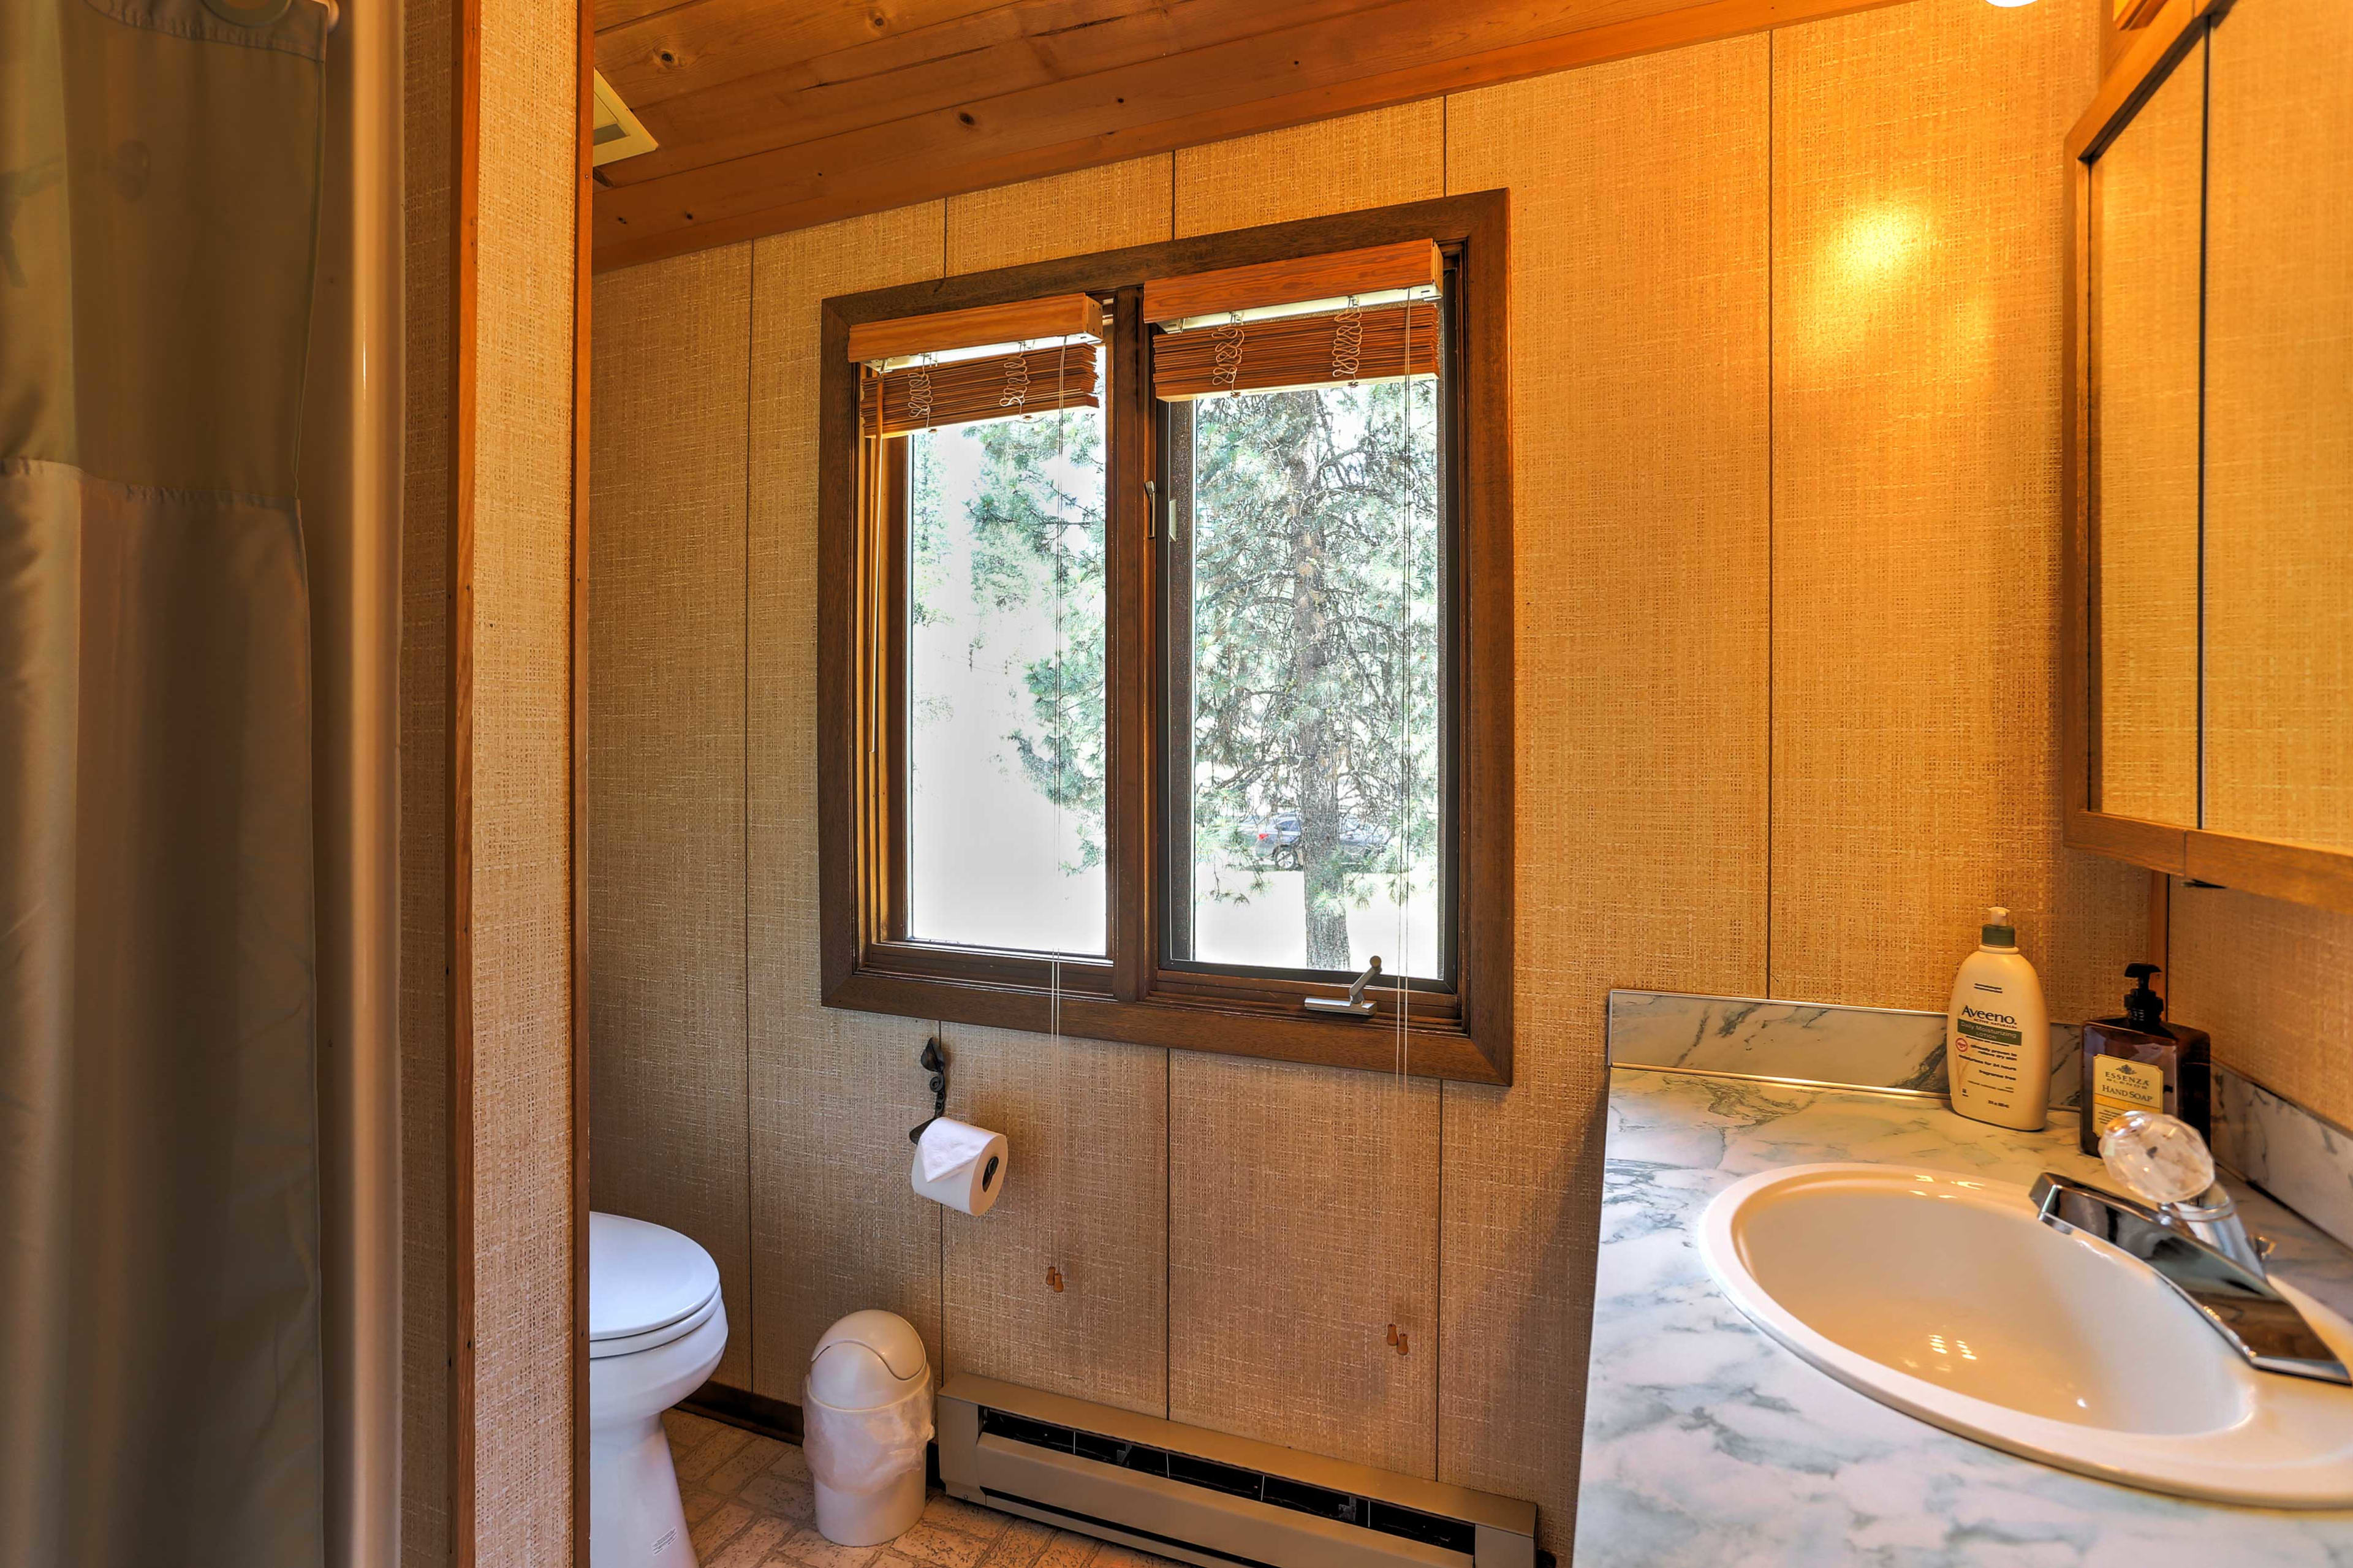 The master bedroom has it's own full bathroom.